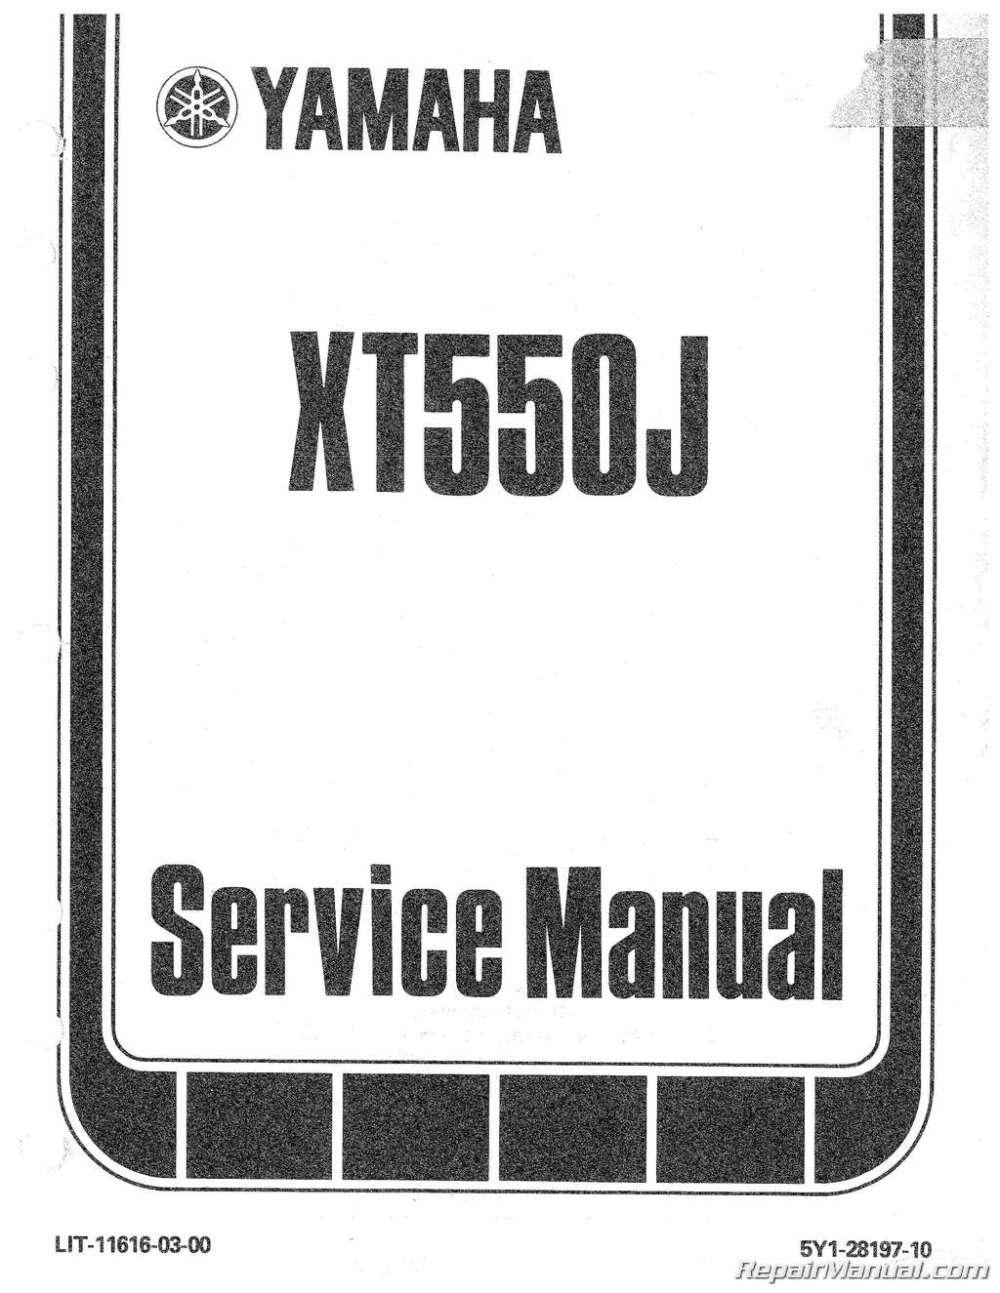 medium resolution of 1982 yamaha xt550 motorcycle service repair maintenance manual 1982 yamaha xt 550 wiring diagram yamaha xt 550 wiring diagram